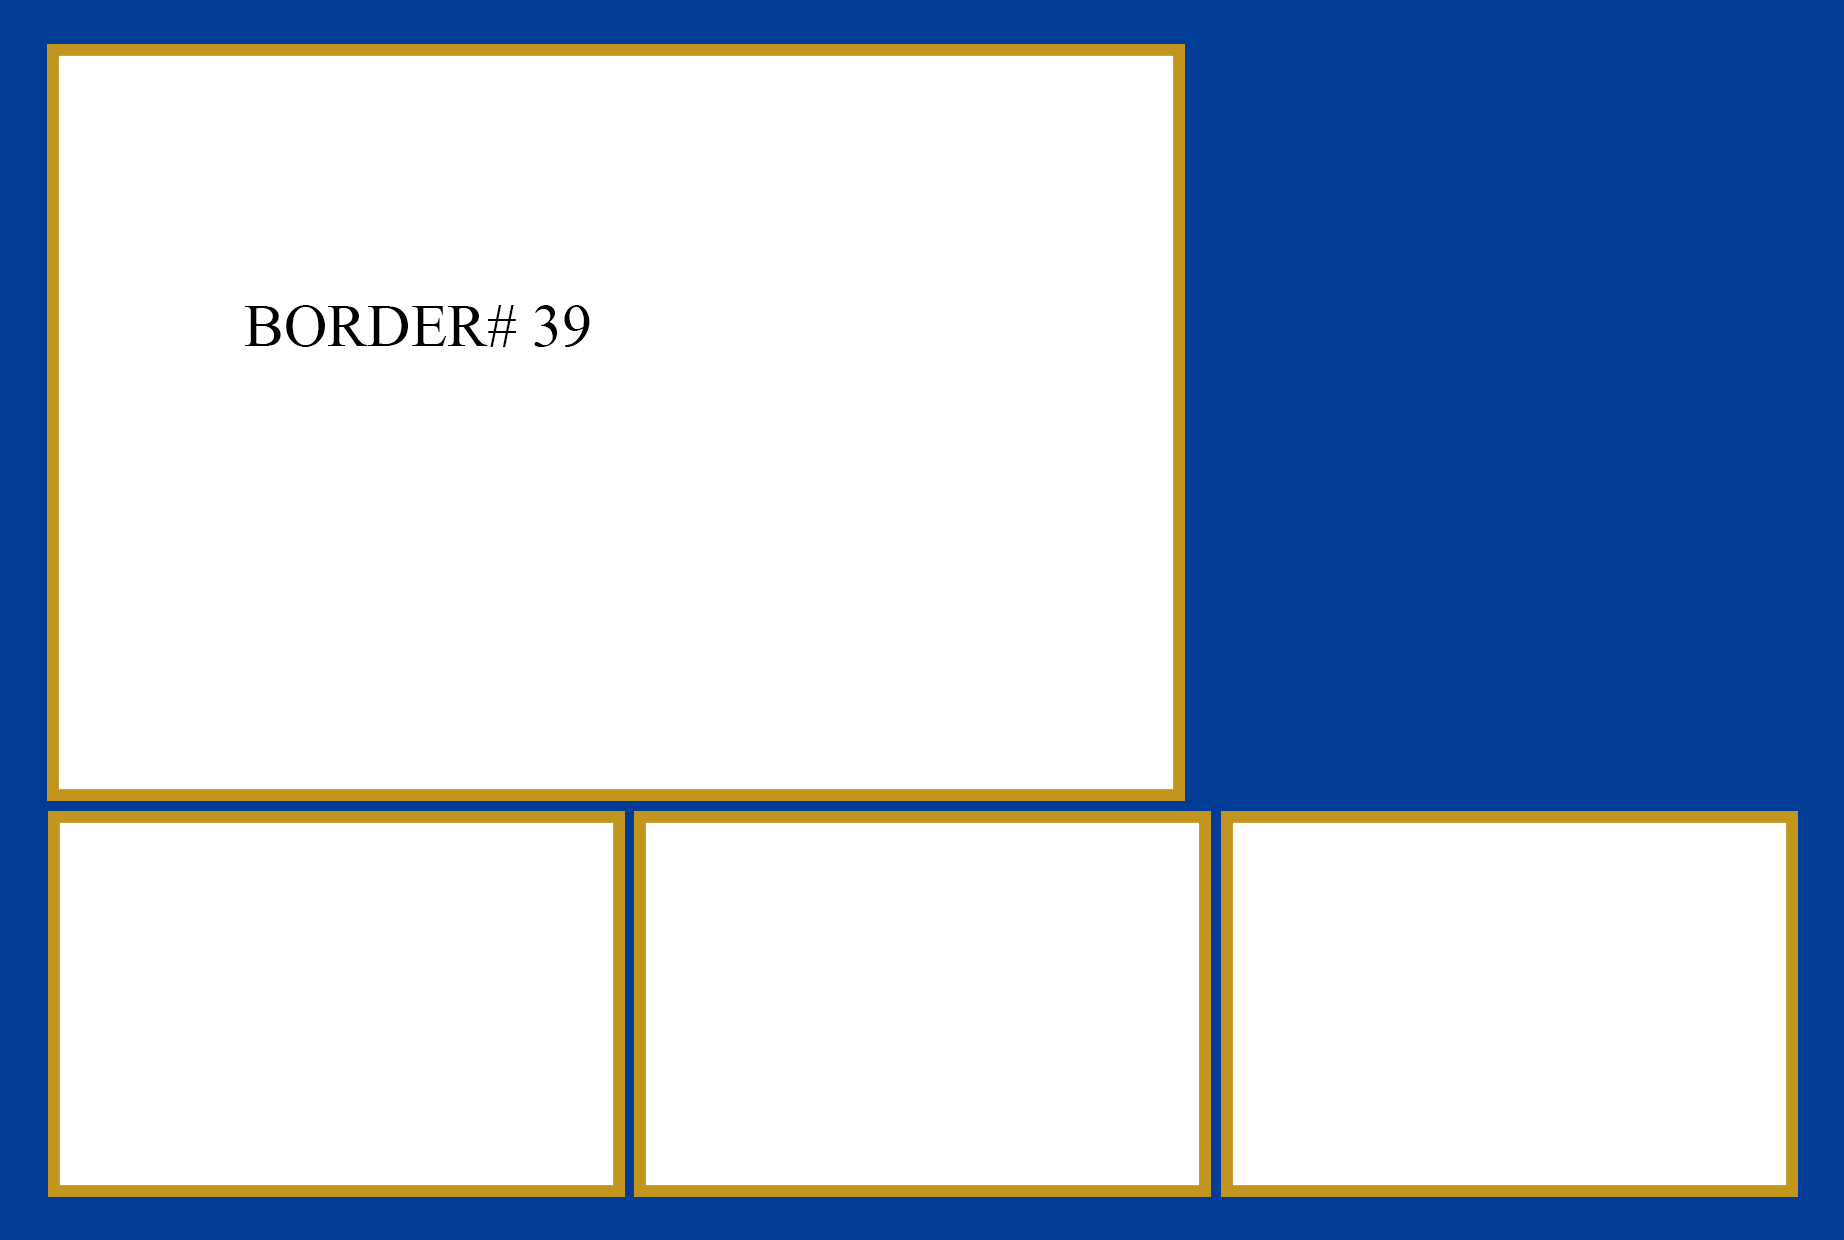 Border#39